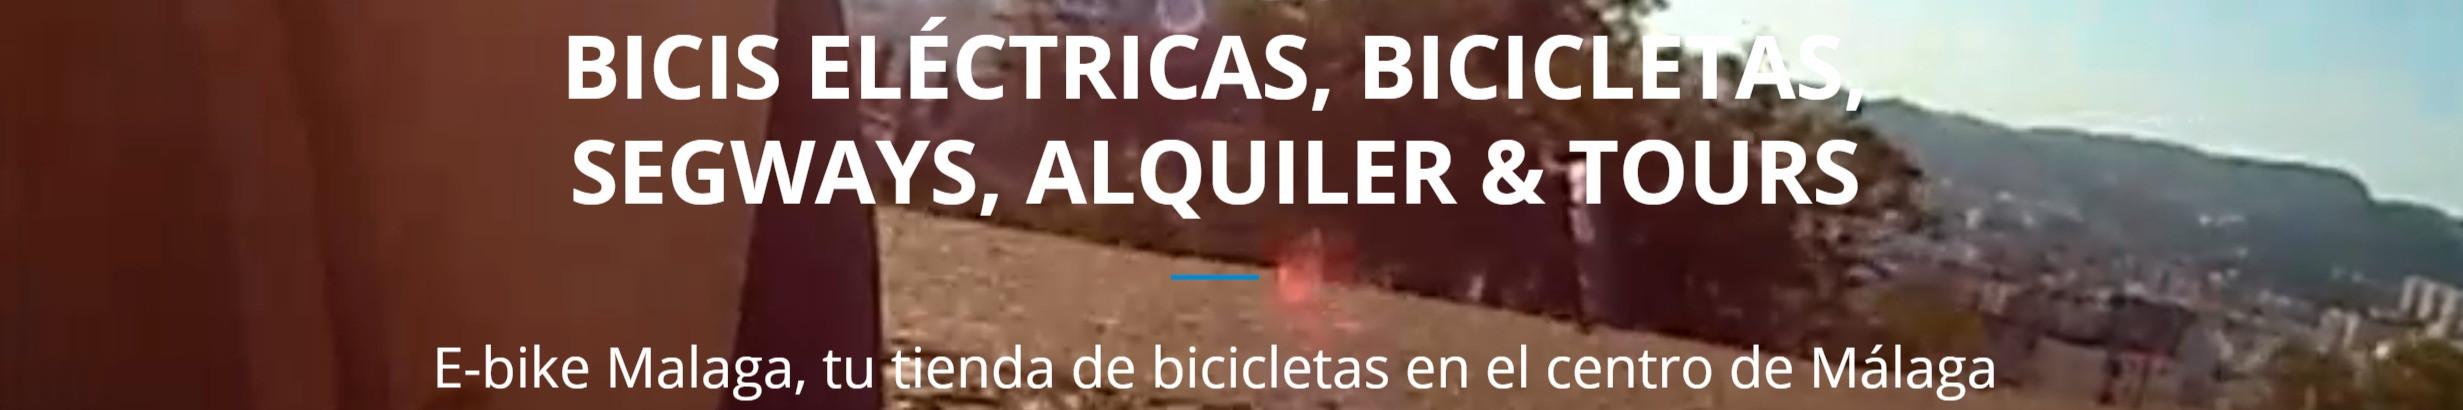 Ebike Bicicletas eléctricas Malaga